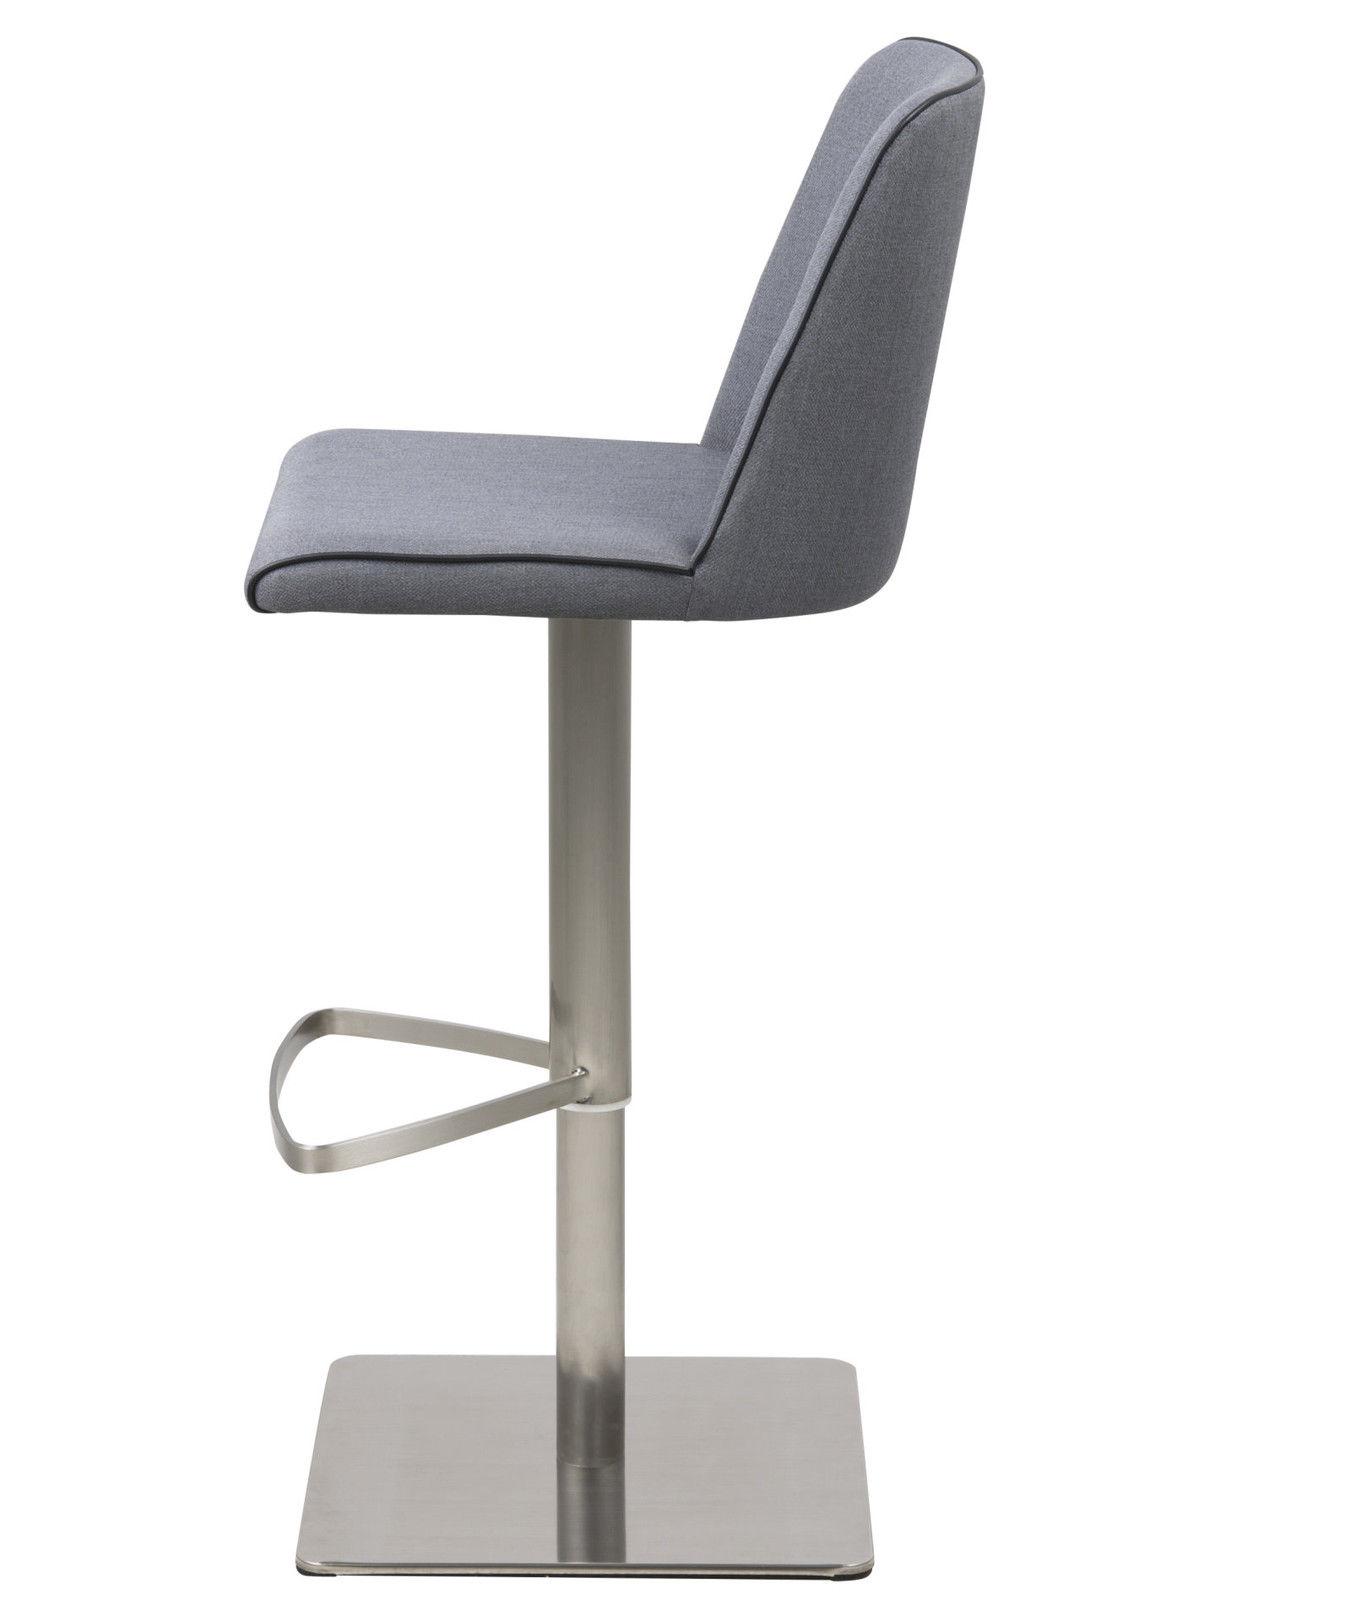 PKline Barhocker Barstuhl Tresenhocker Hocker grau Stühle ...